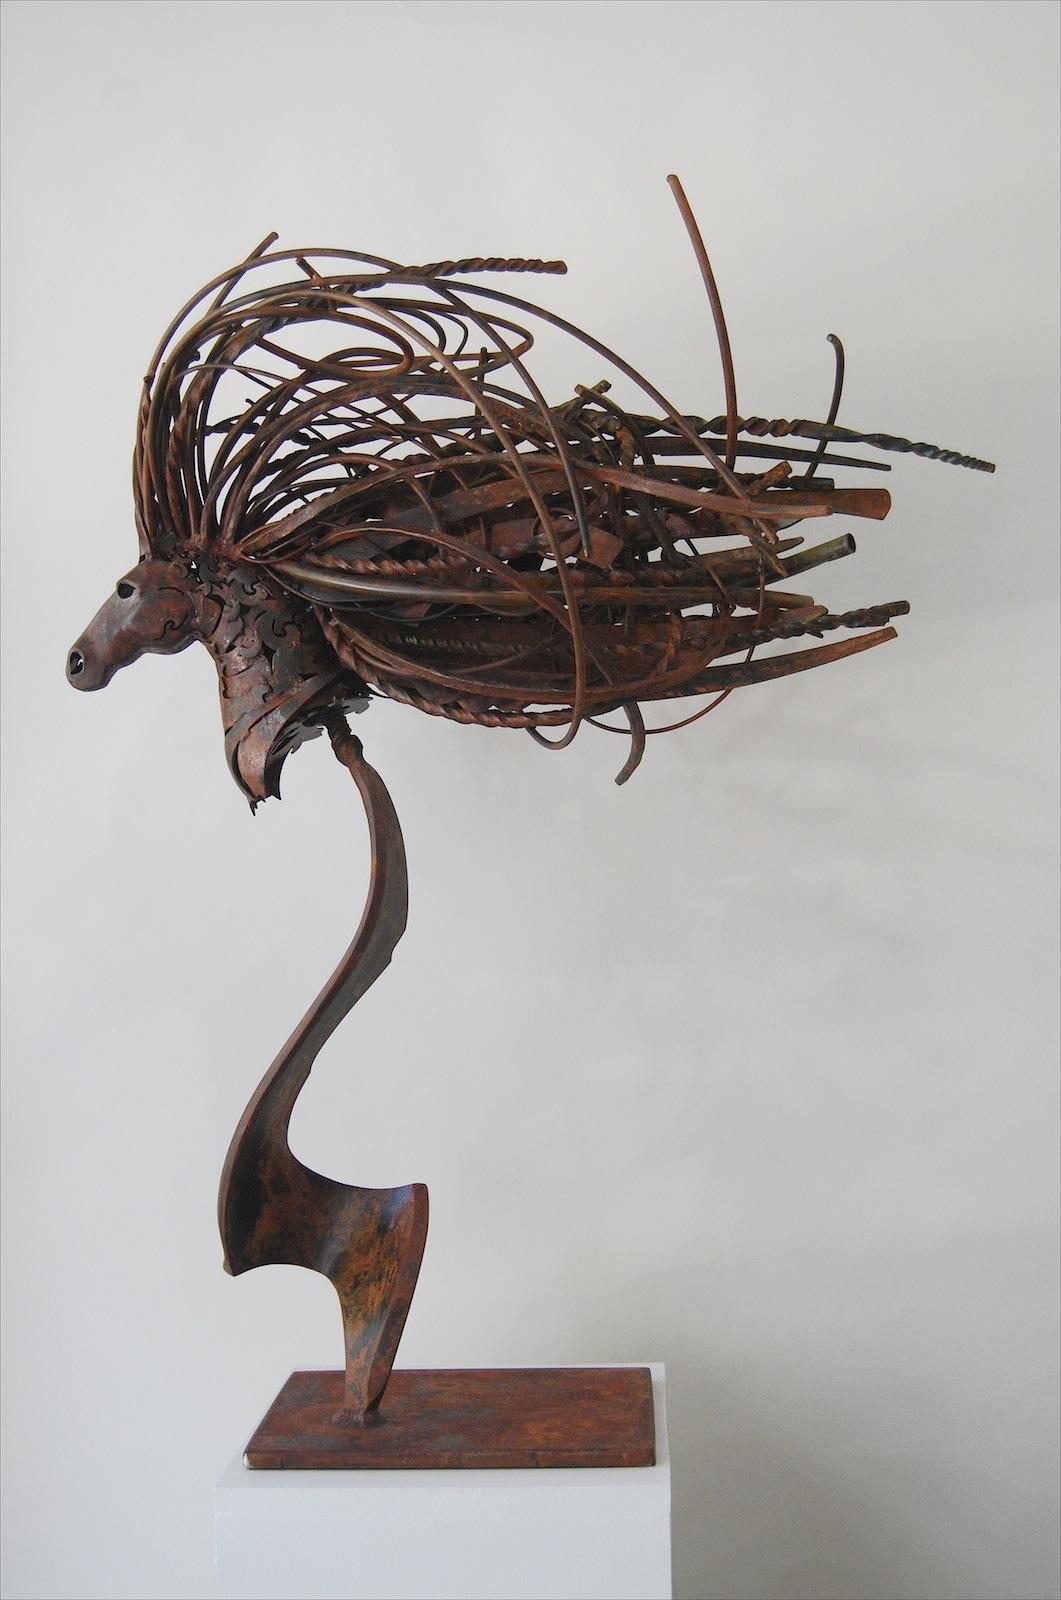 Metal Artwork For Sale Metal Horse Art Sculptureflorida Artist Doug Hays